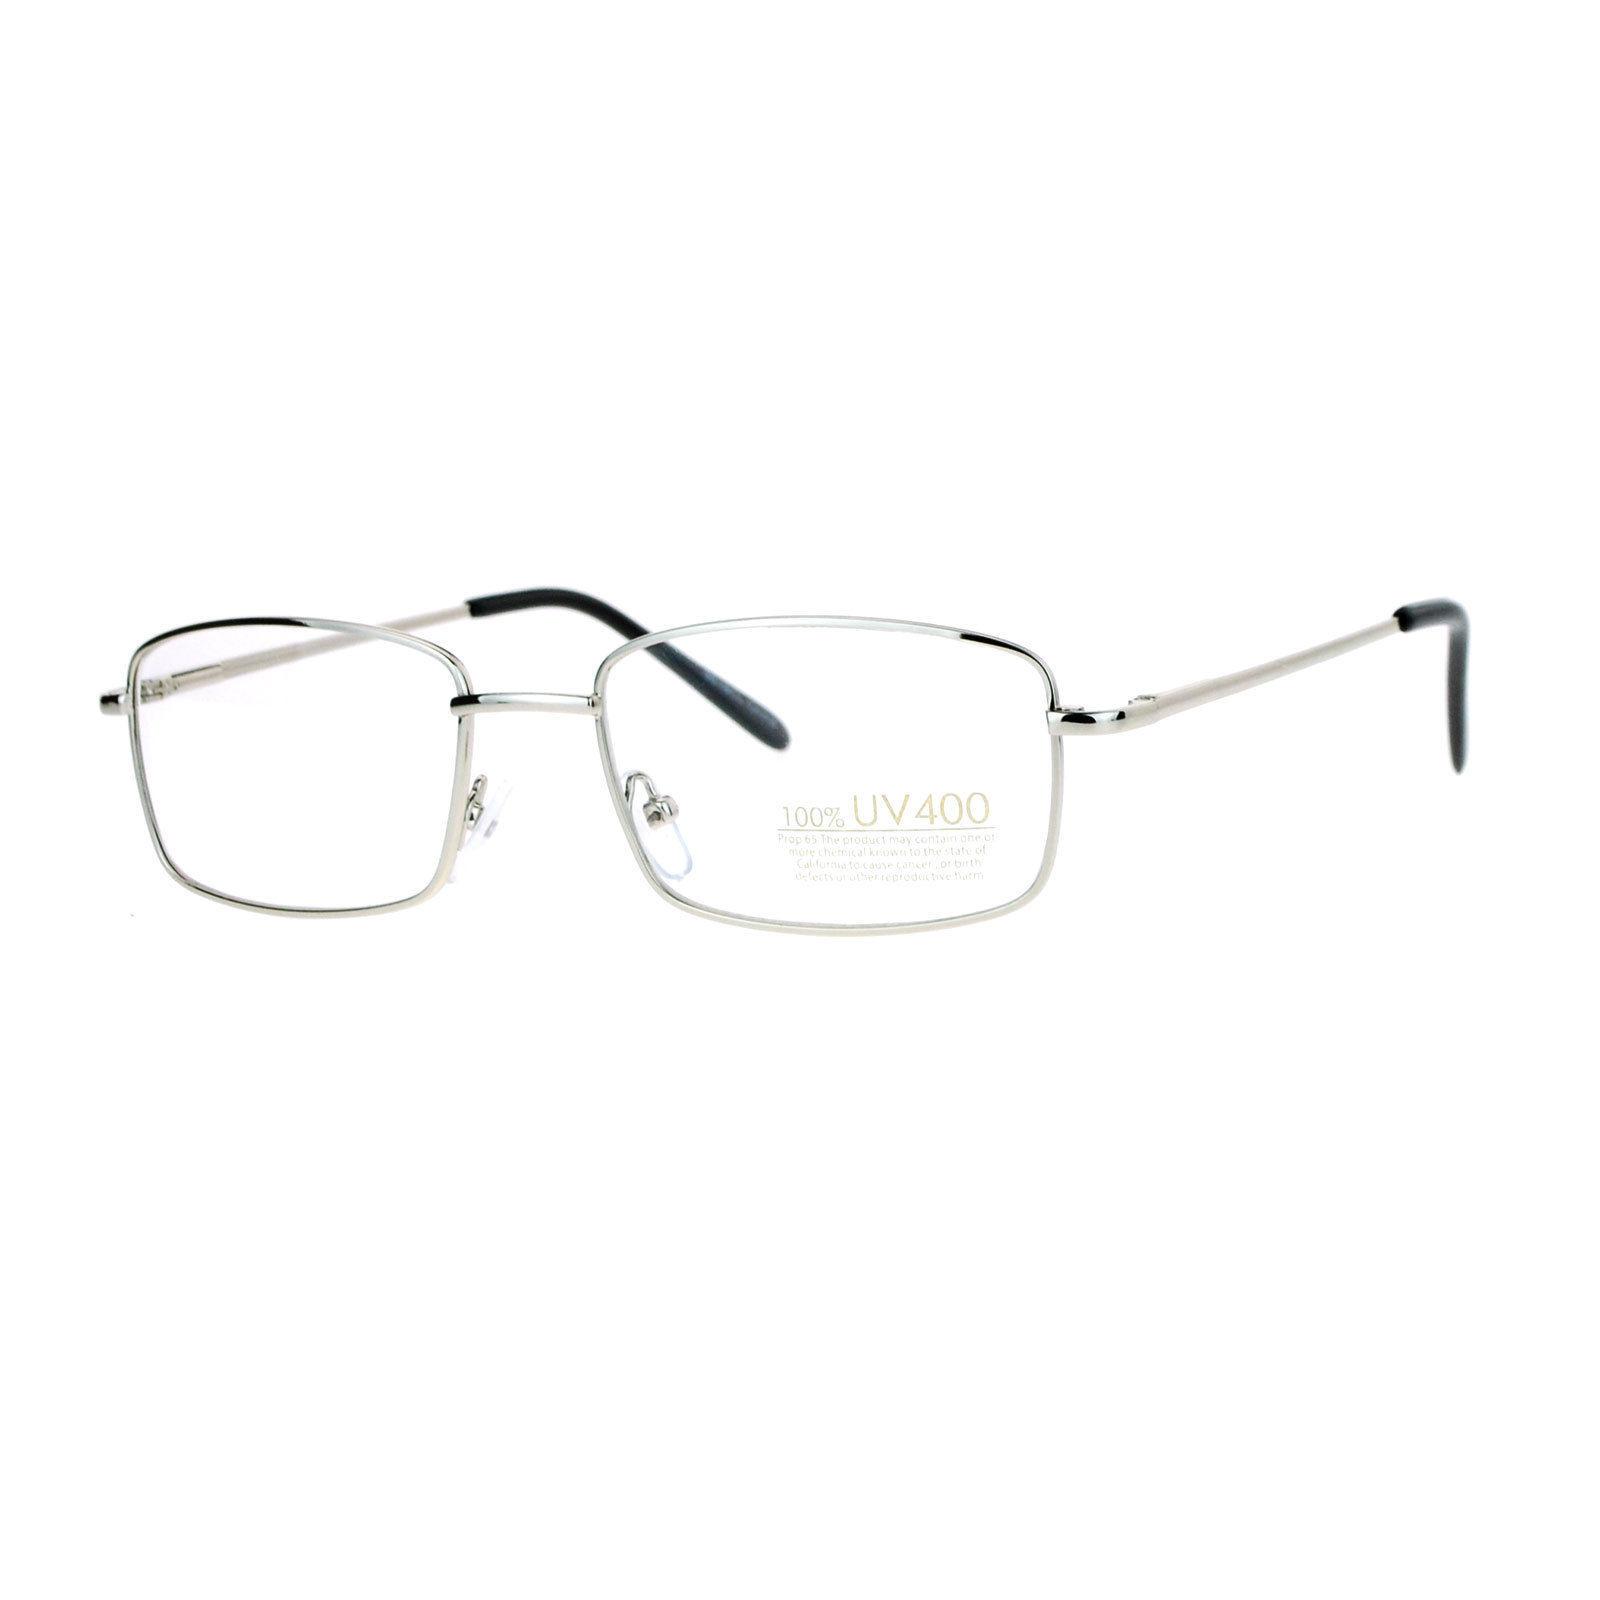 Small Frame Eyeglasses Thin Metal Rectangular Fashion Glasses Spring Hinge